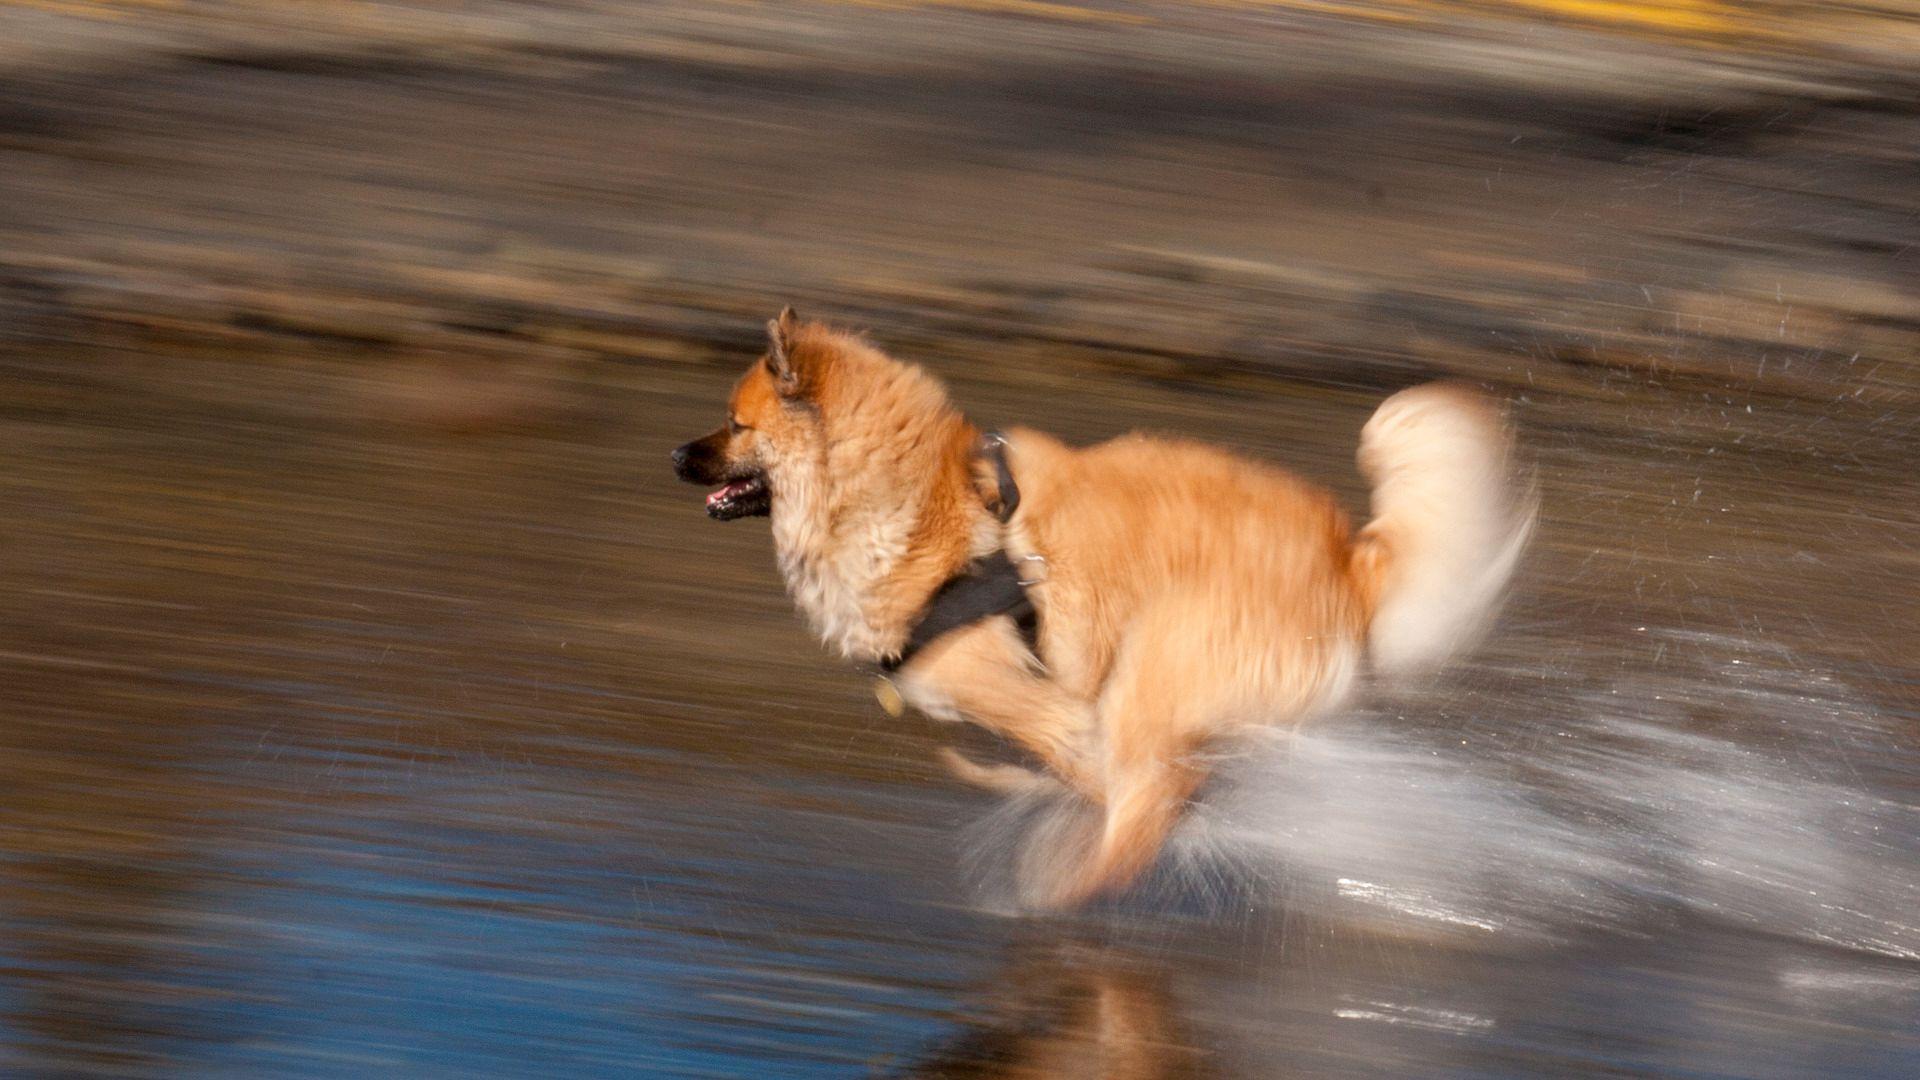 Med lukkertid på for eksempel 1/30 kommer raske bevegelser tydelig frem. (Foto: Kristoffer Møllevik)